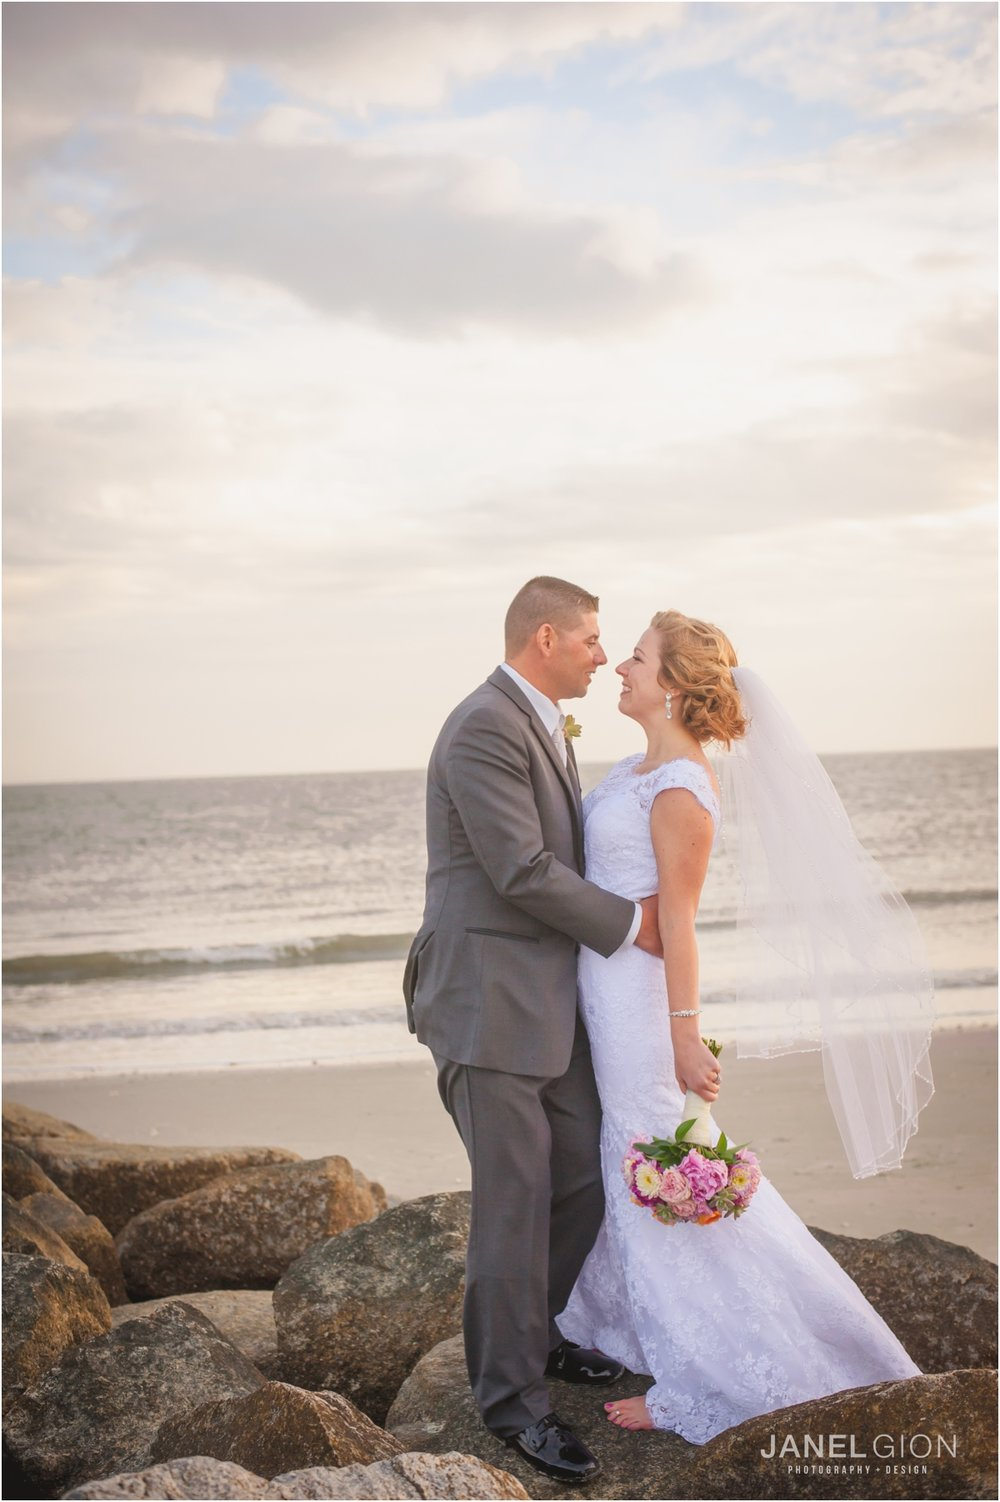 Janel-Gion-Hilton-Head-Island-SC-Destination-Wedding-Photographer_0026